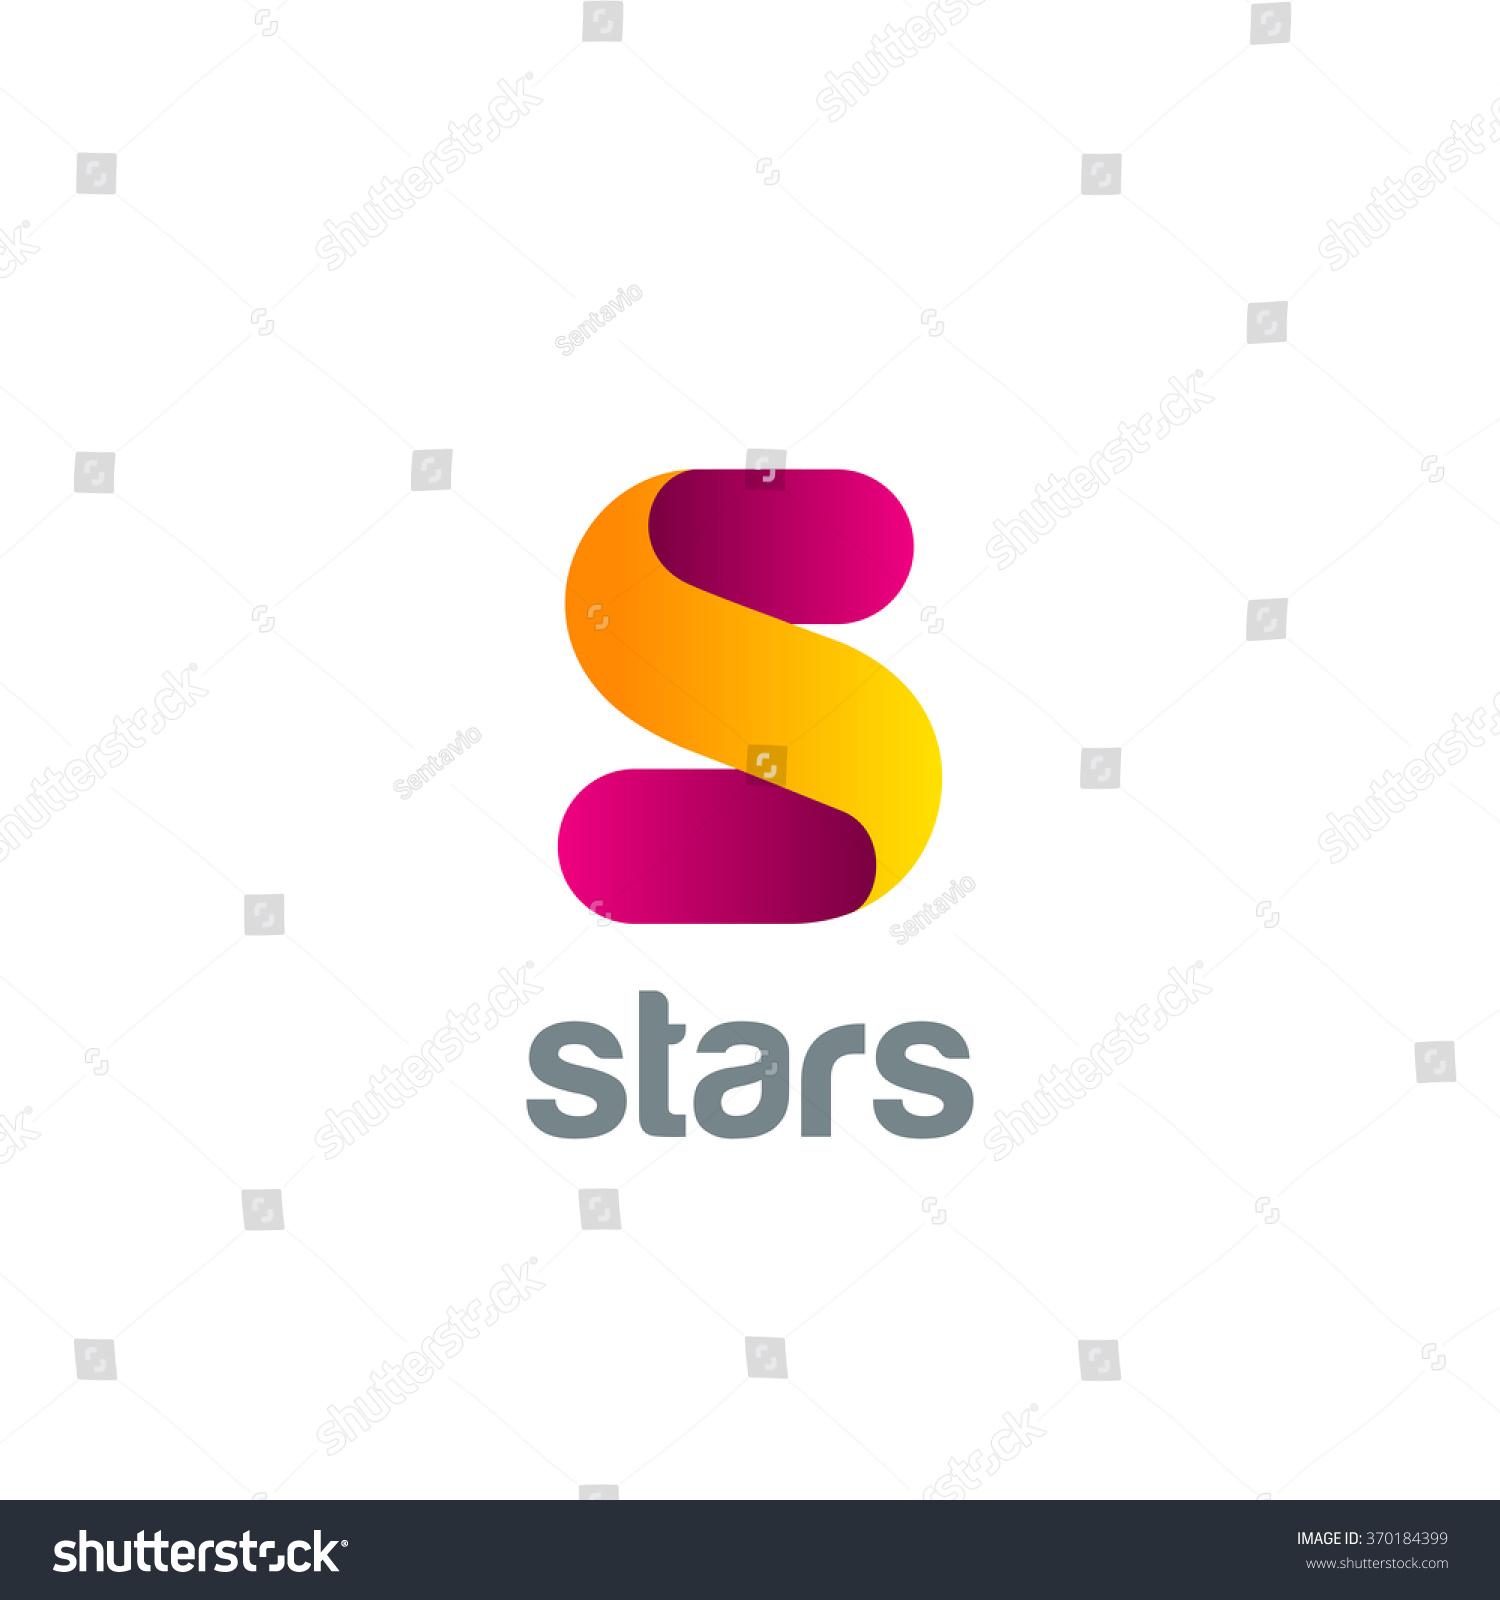 Funny Logo Creator  1000s of Funny Logo Creator Ideas